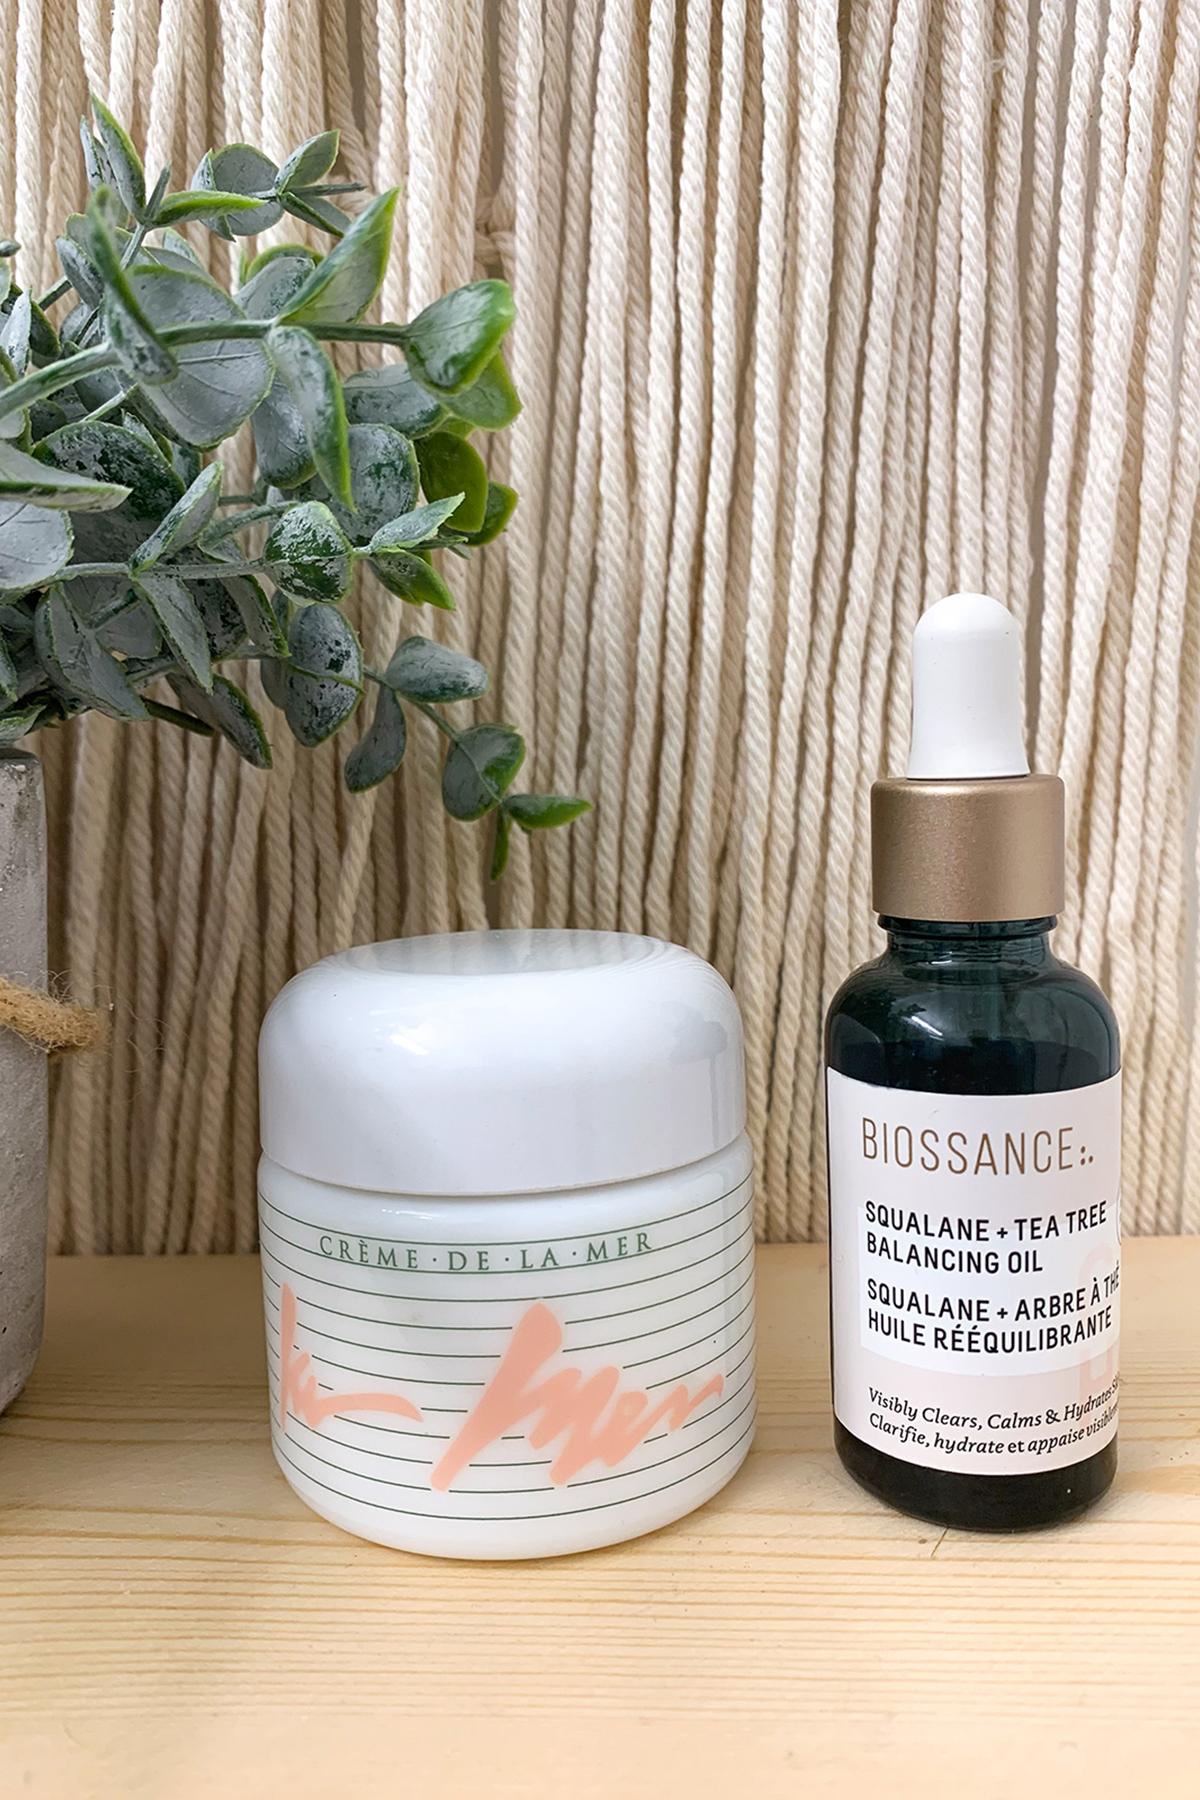 BIOSSANCE Squalane + Tea Tree Balancing Oil and LA MER Crème de la Mer Moisturizer